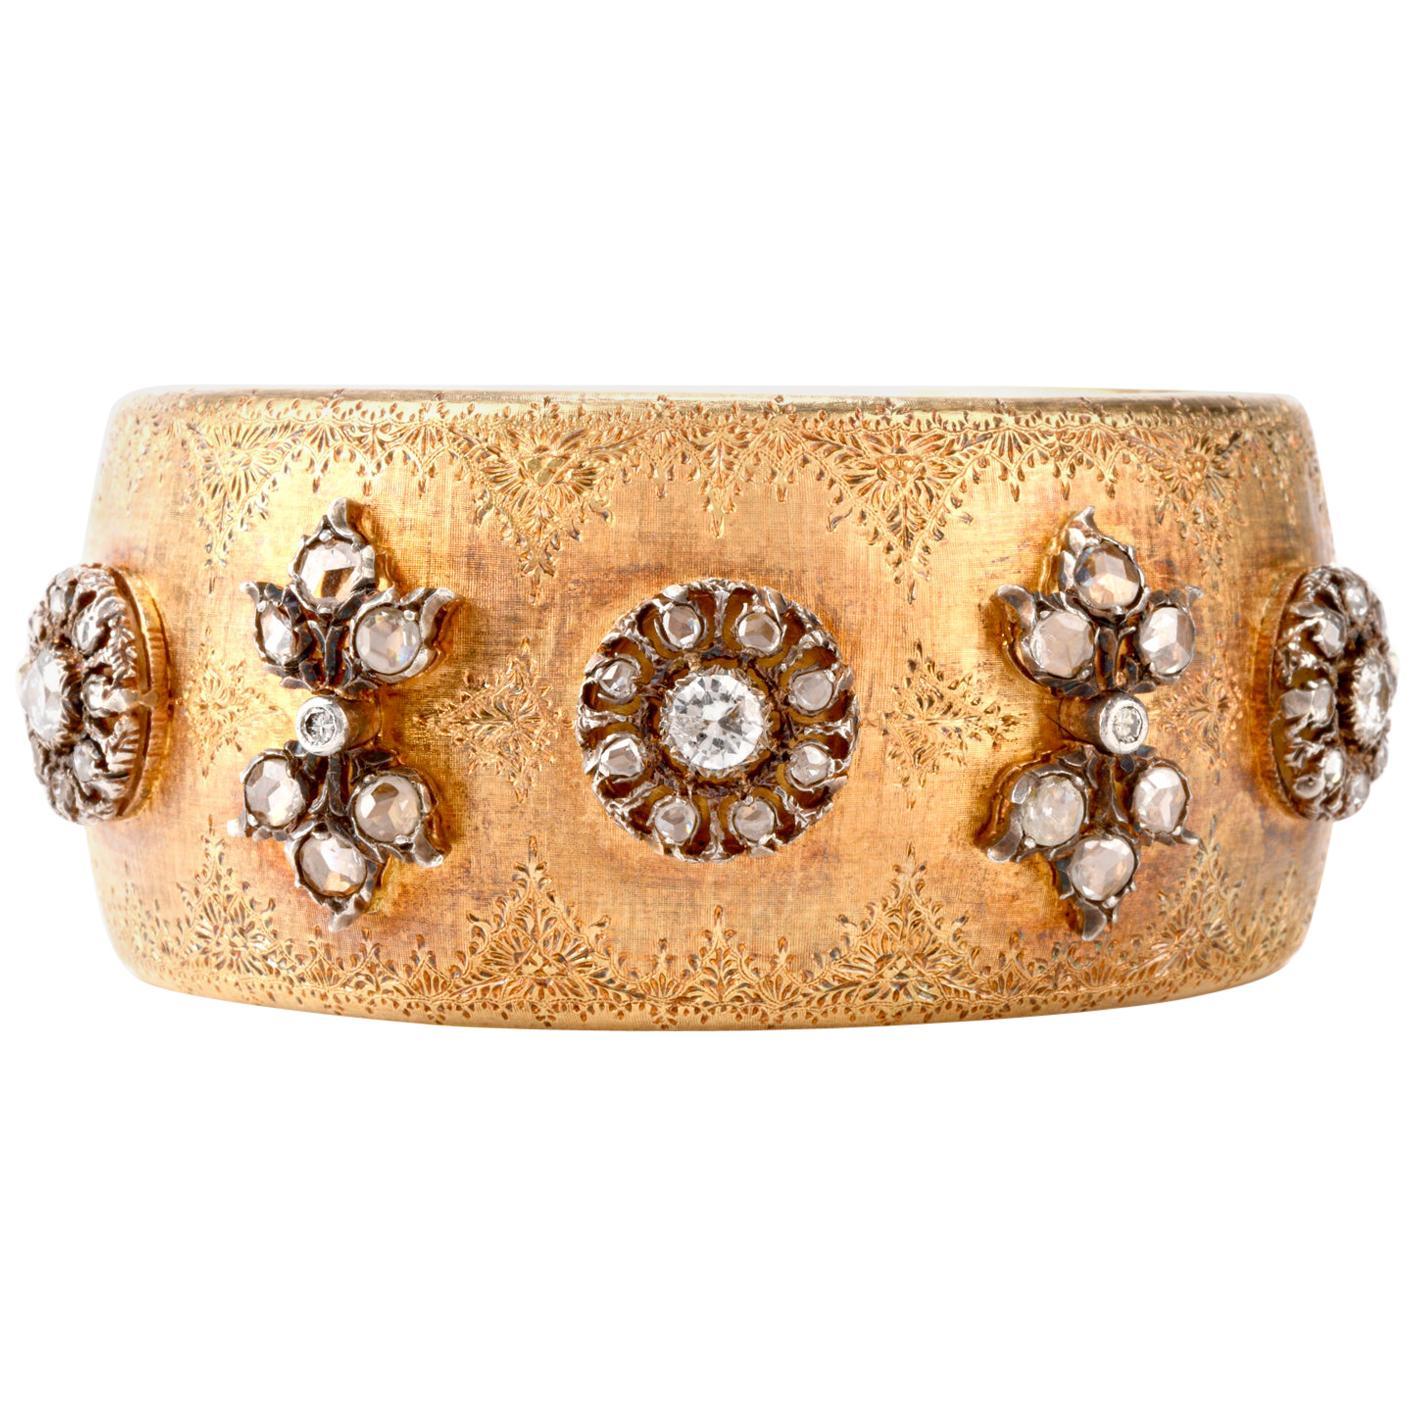 Mario Buccellati Rose Cut Diamond Wide Cuff Bangle 8 Karat Gold Bracelet